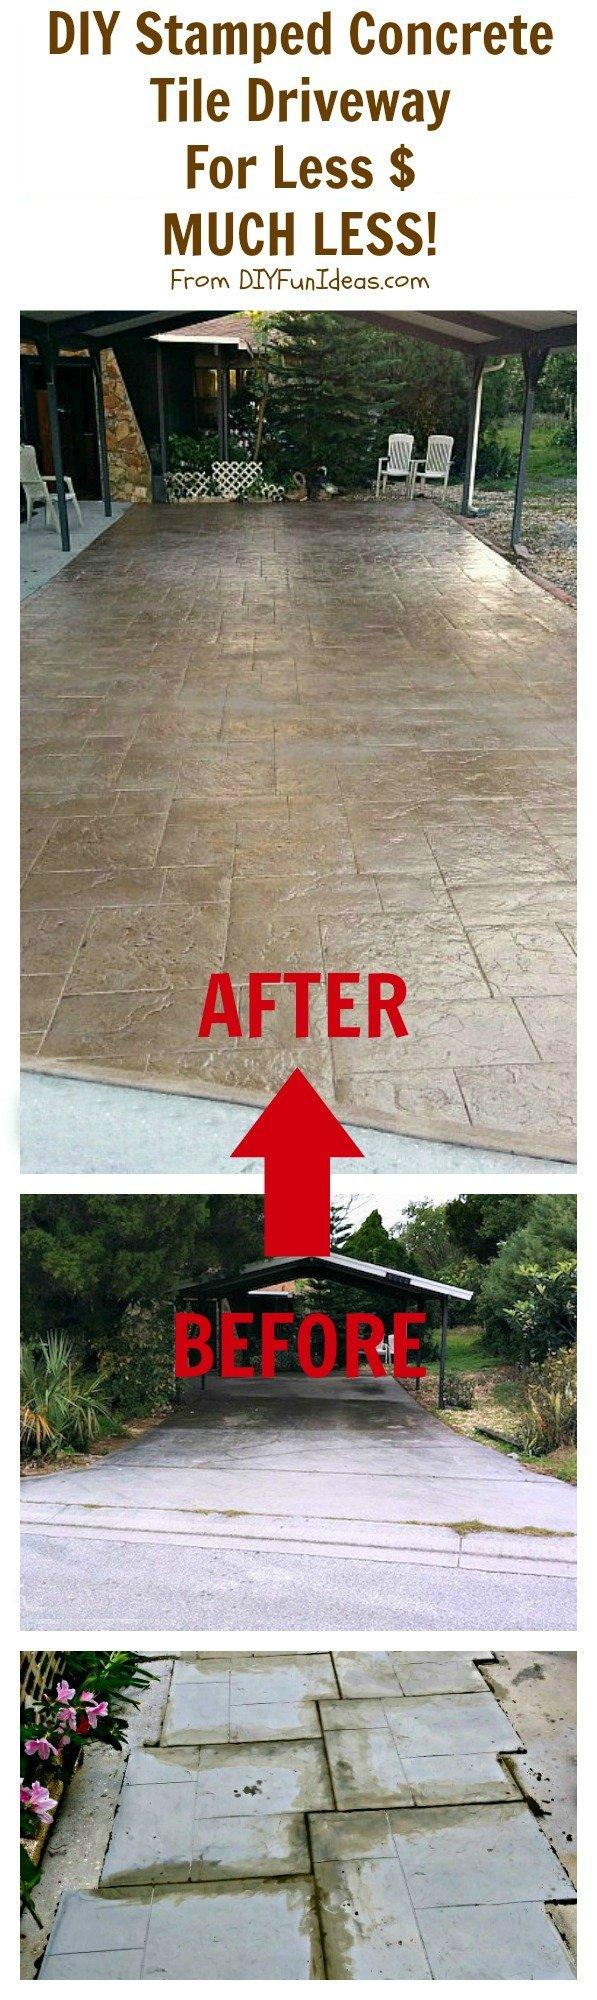 DIY Stamped Concrete Driveway